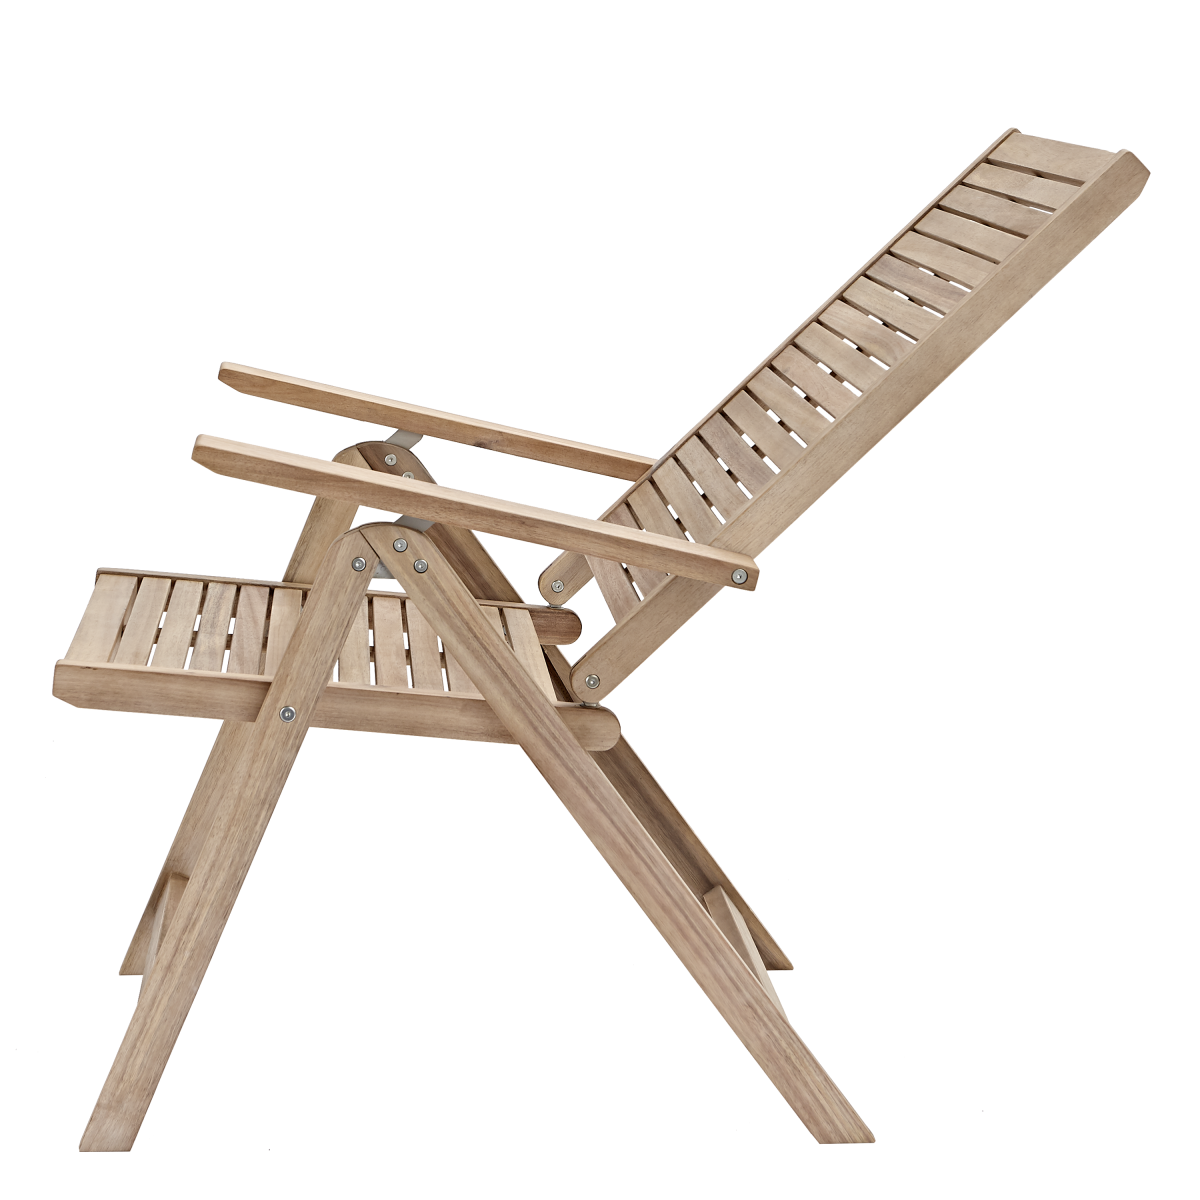 Кресло Садовое Naterial Solaris Origami Складное 59Х59Х1095 Акация Светло-Коричневый